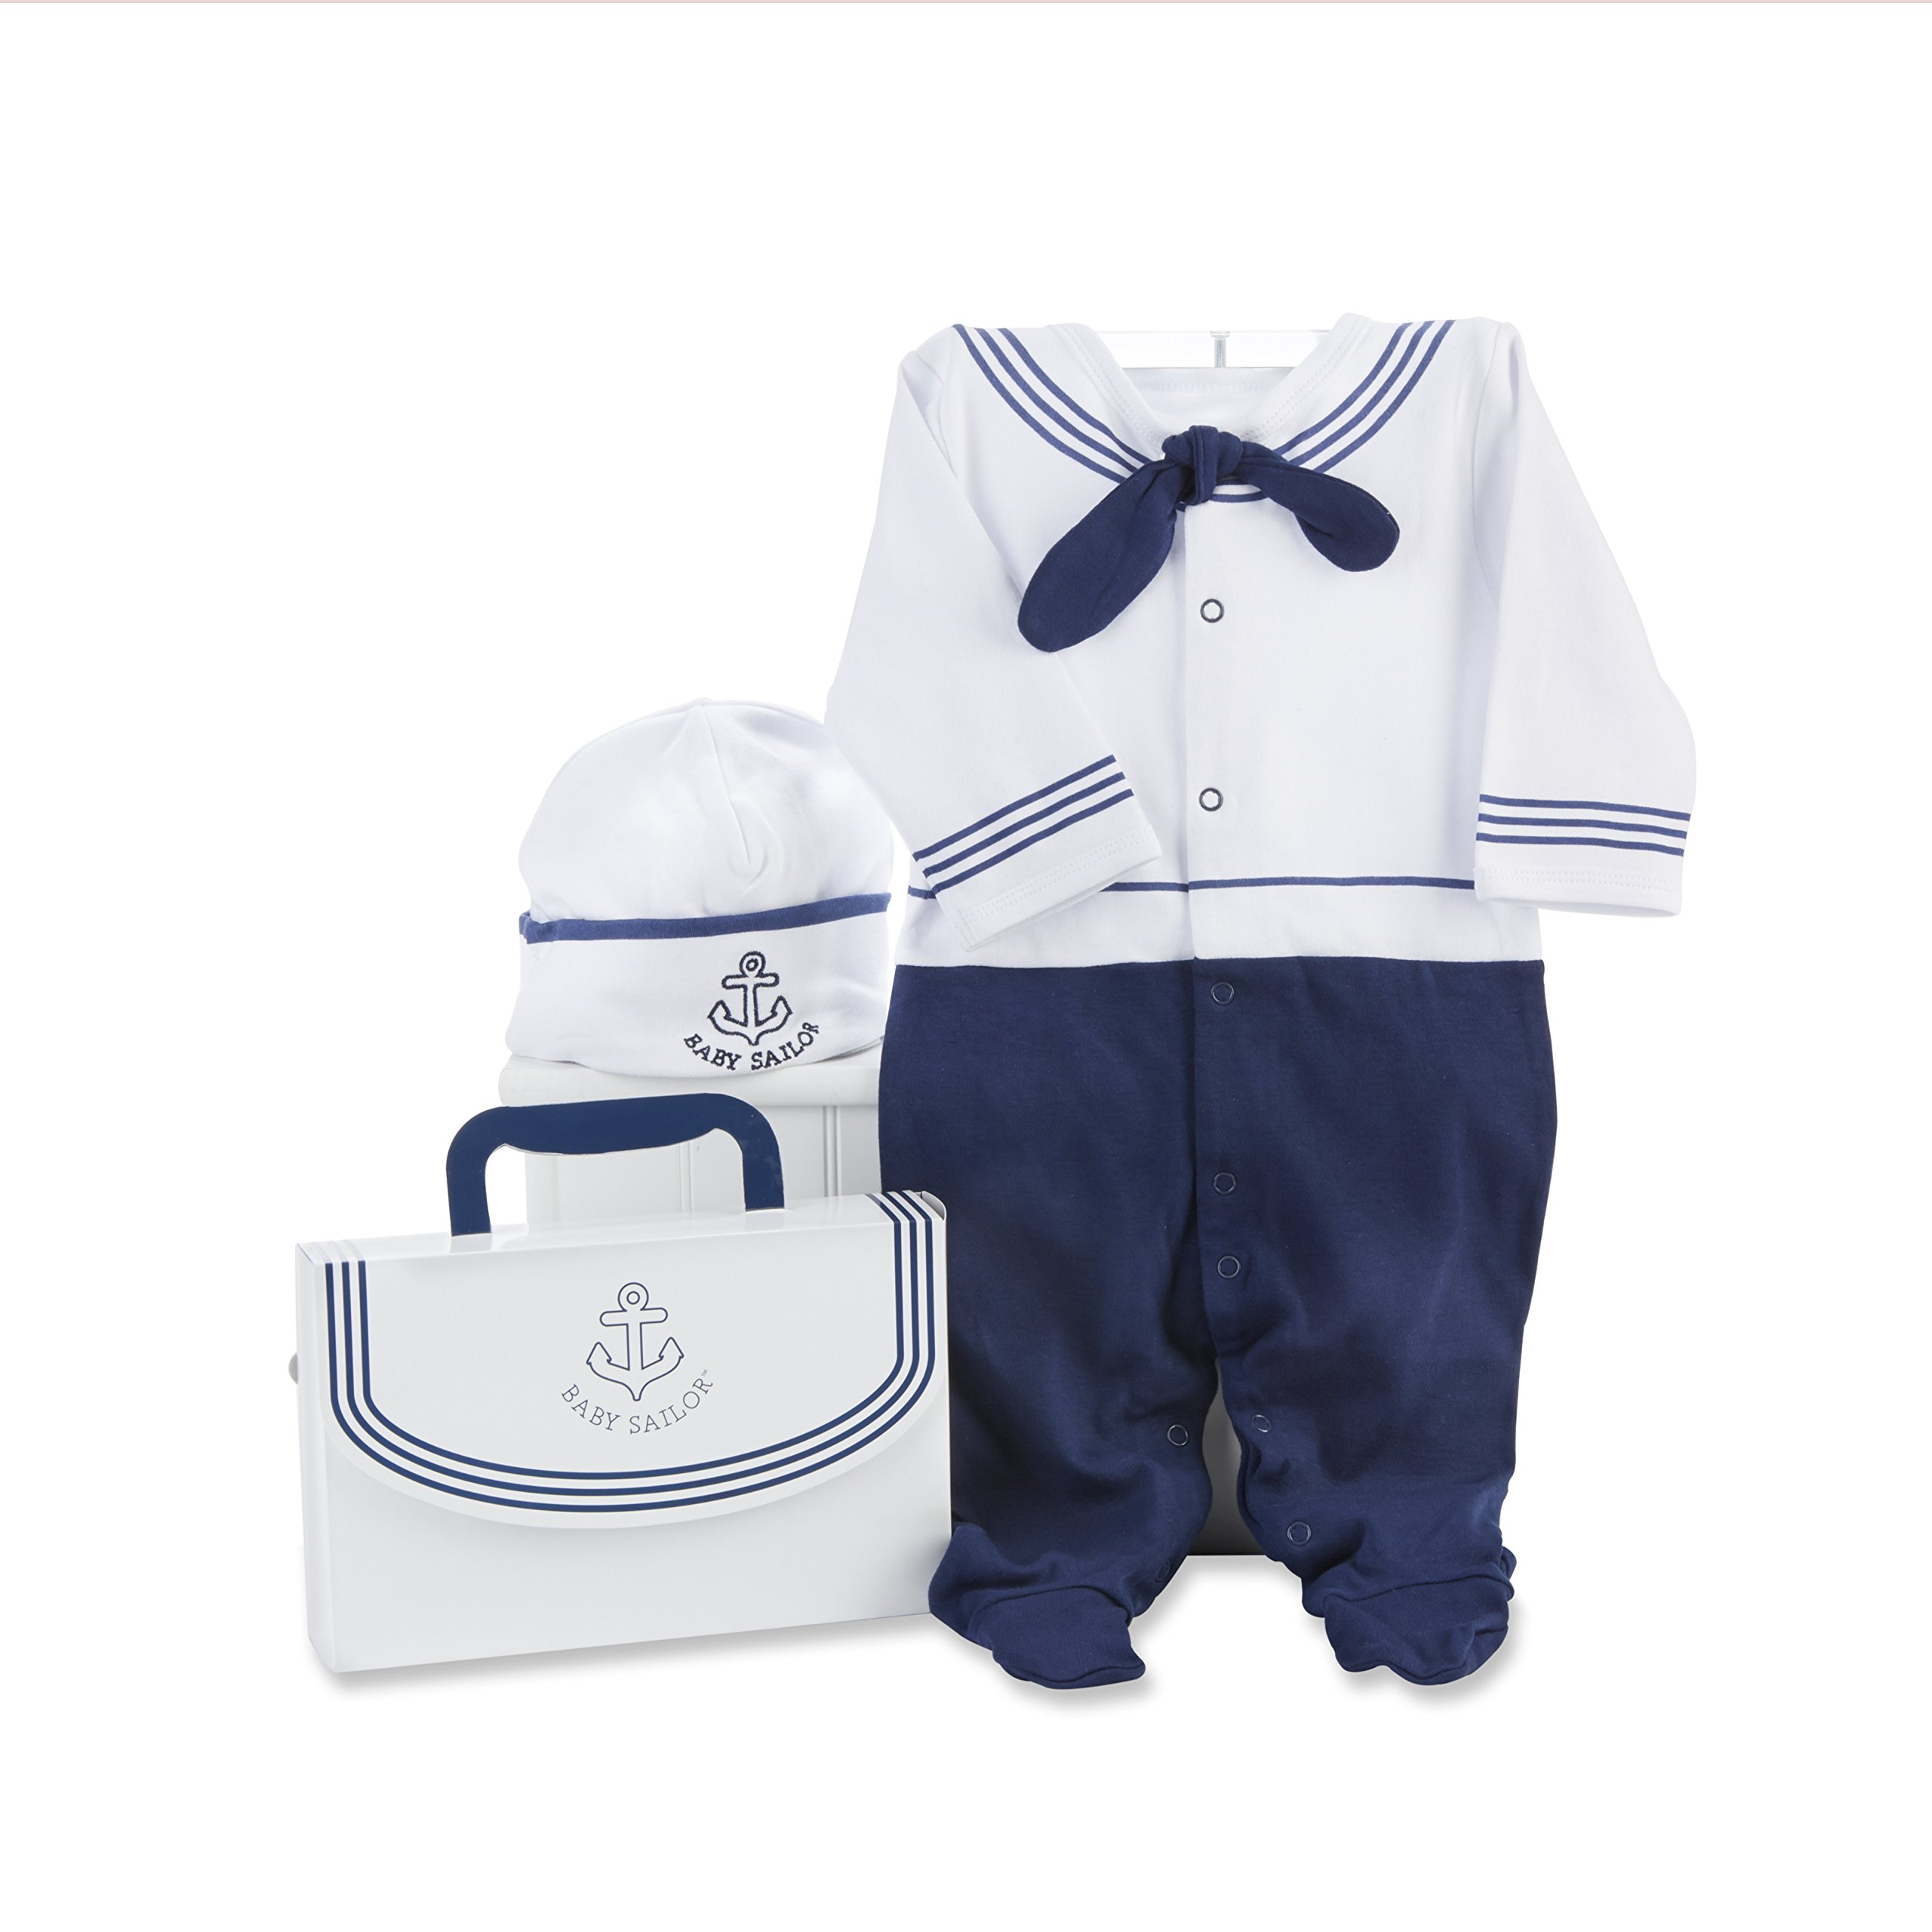 Baby Aspen Big Dreamzzz Baby Sailor Two-Piece Layette Set, Blue/White, 0-6 Months